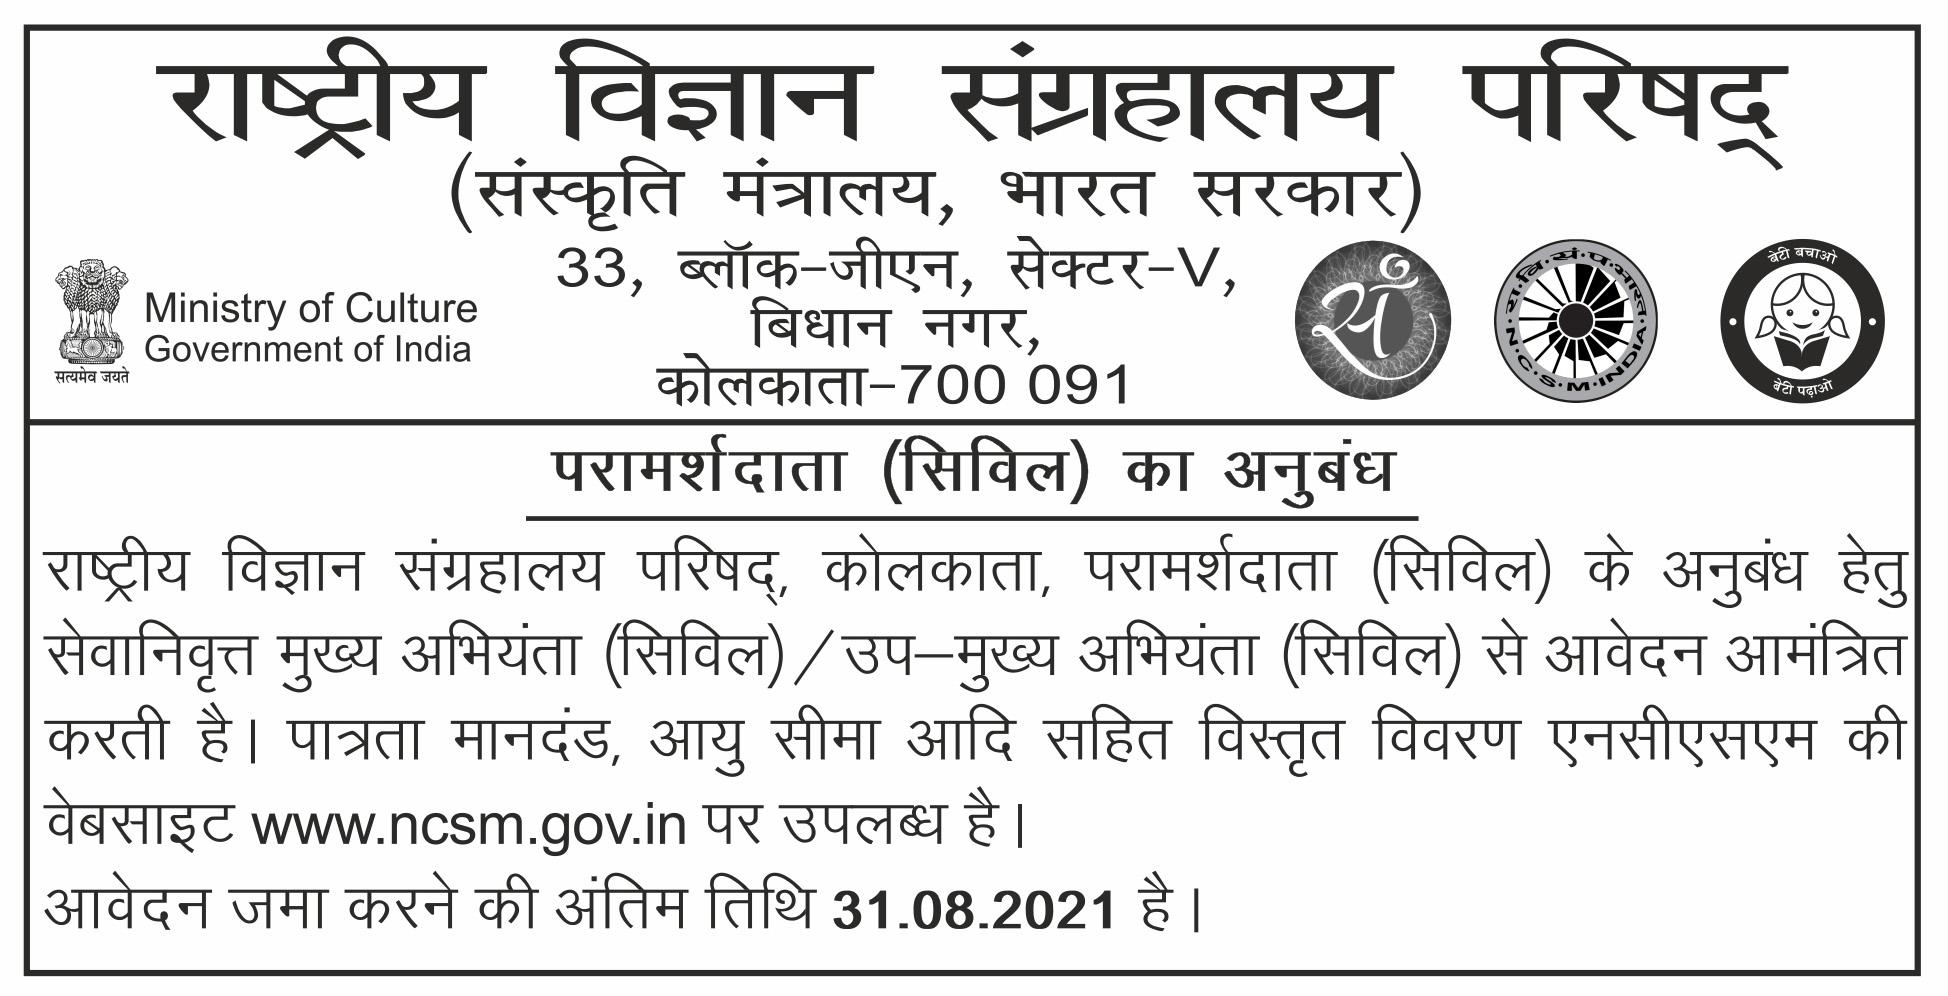 Consultant Civil Hindi Adv.